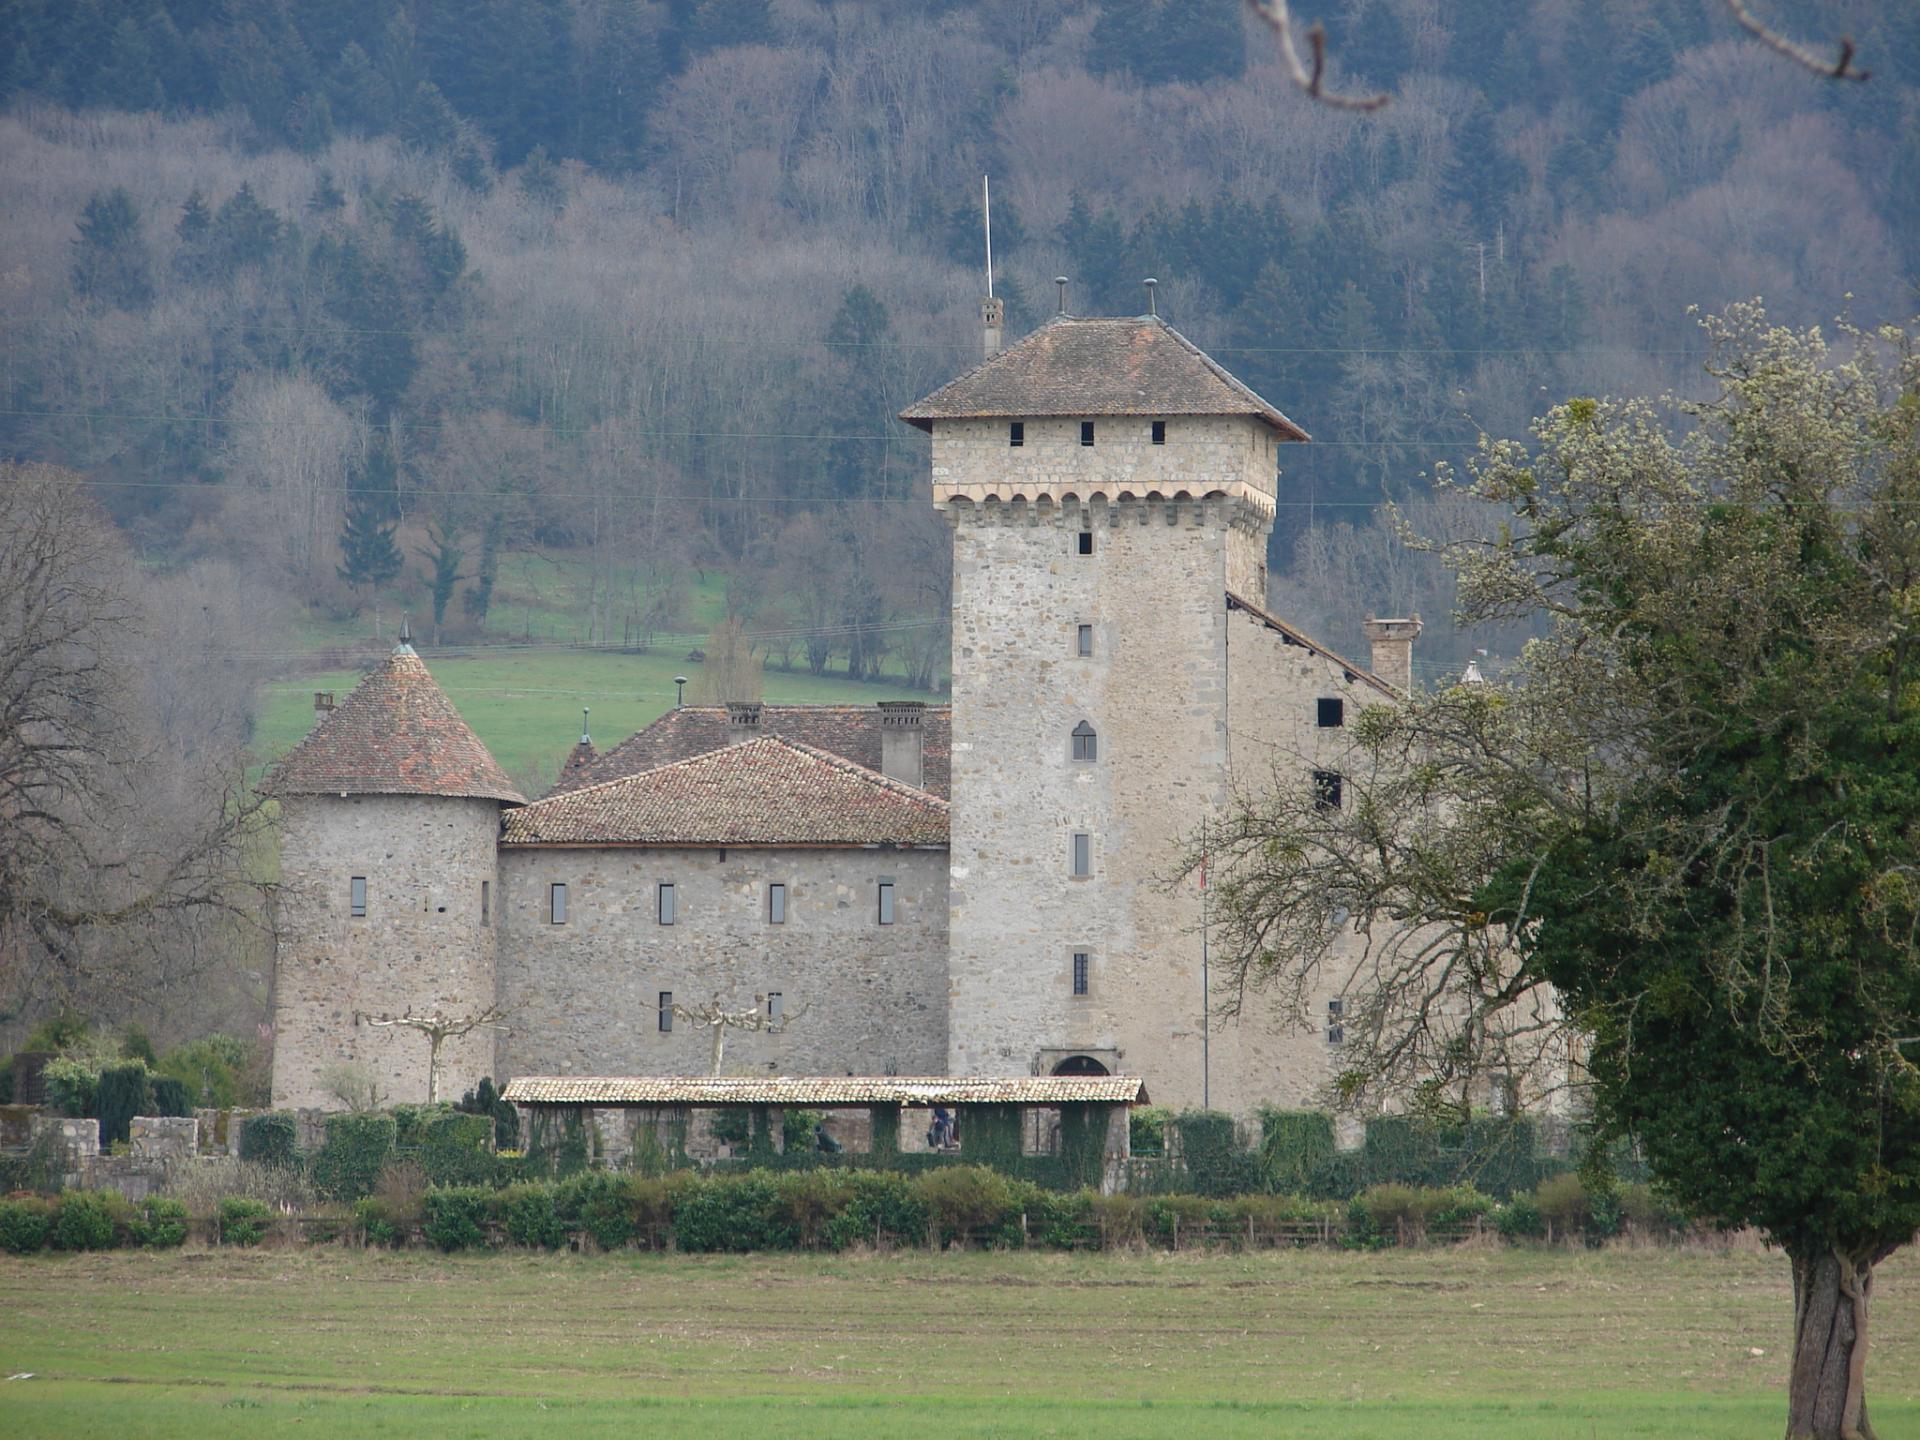 Son chateau